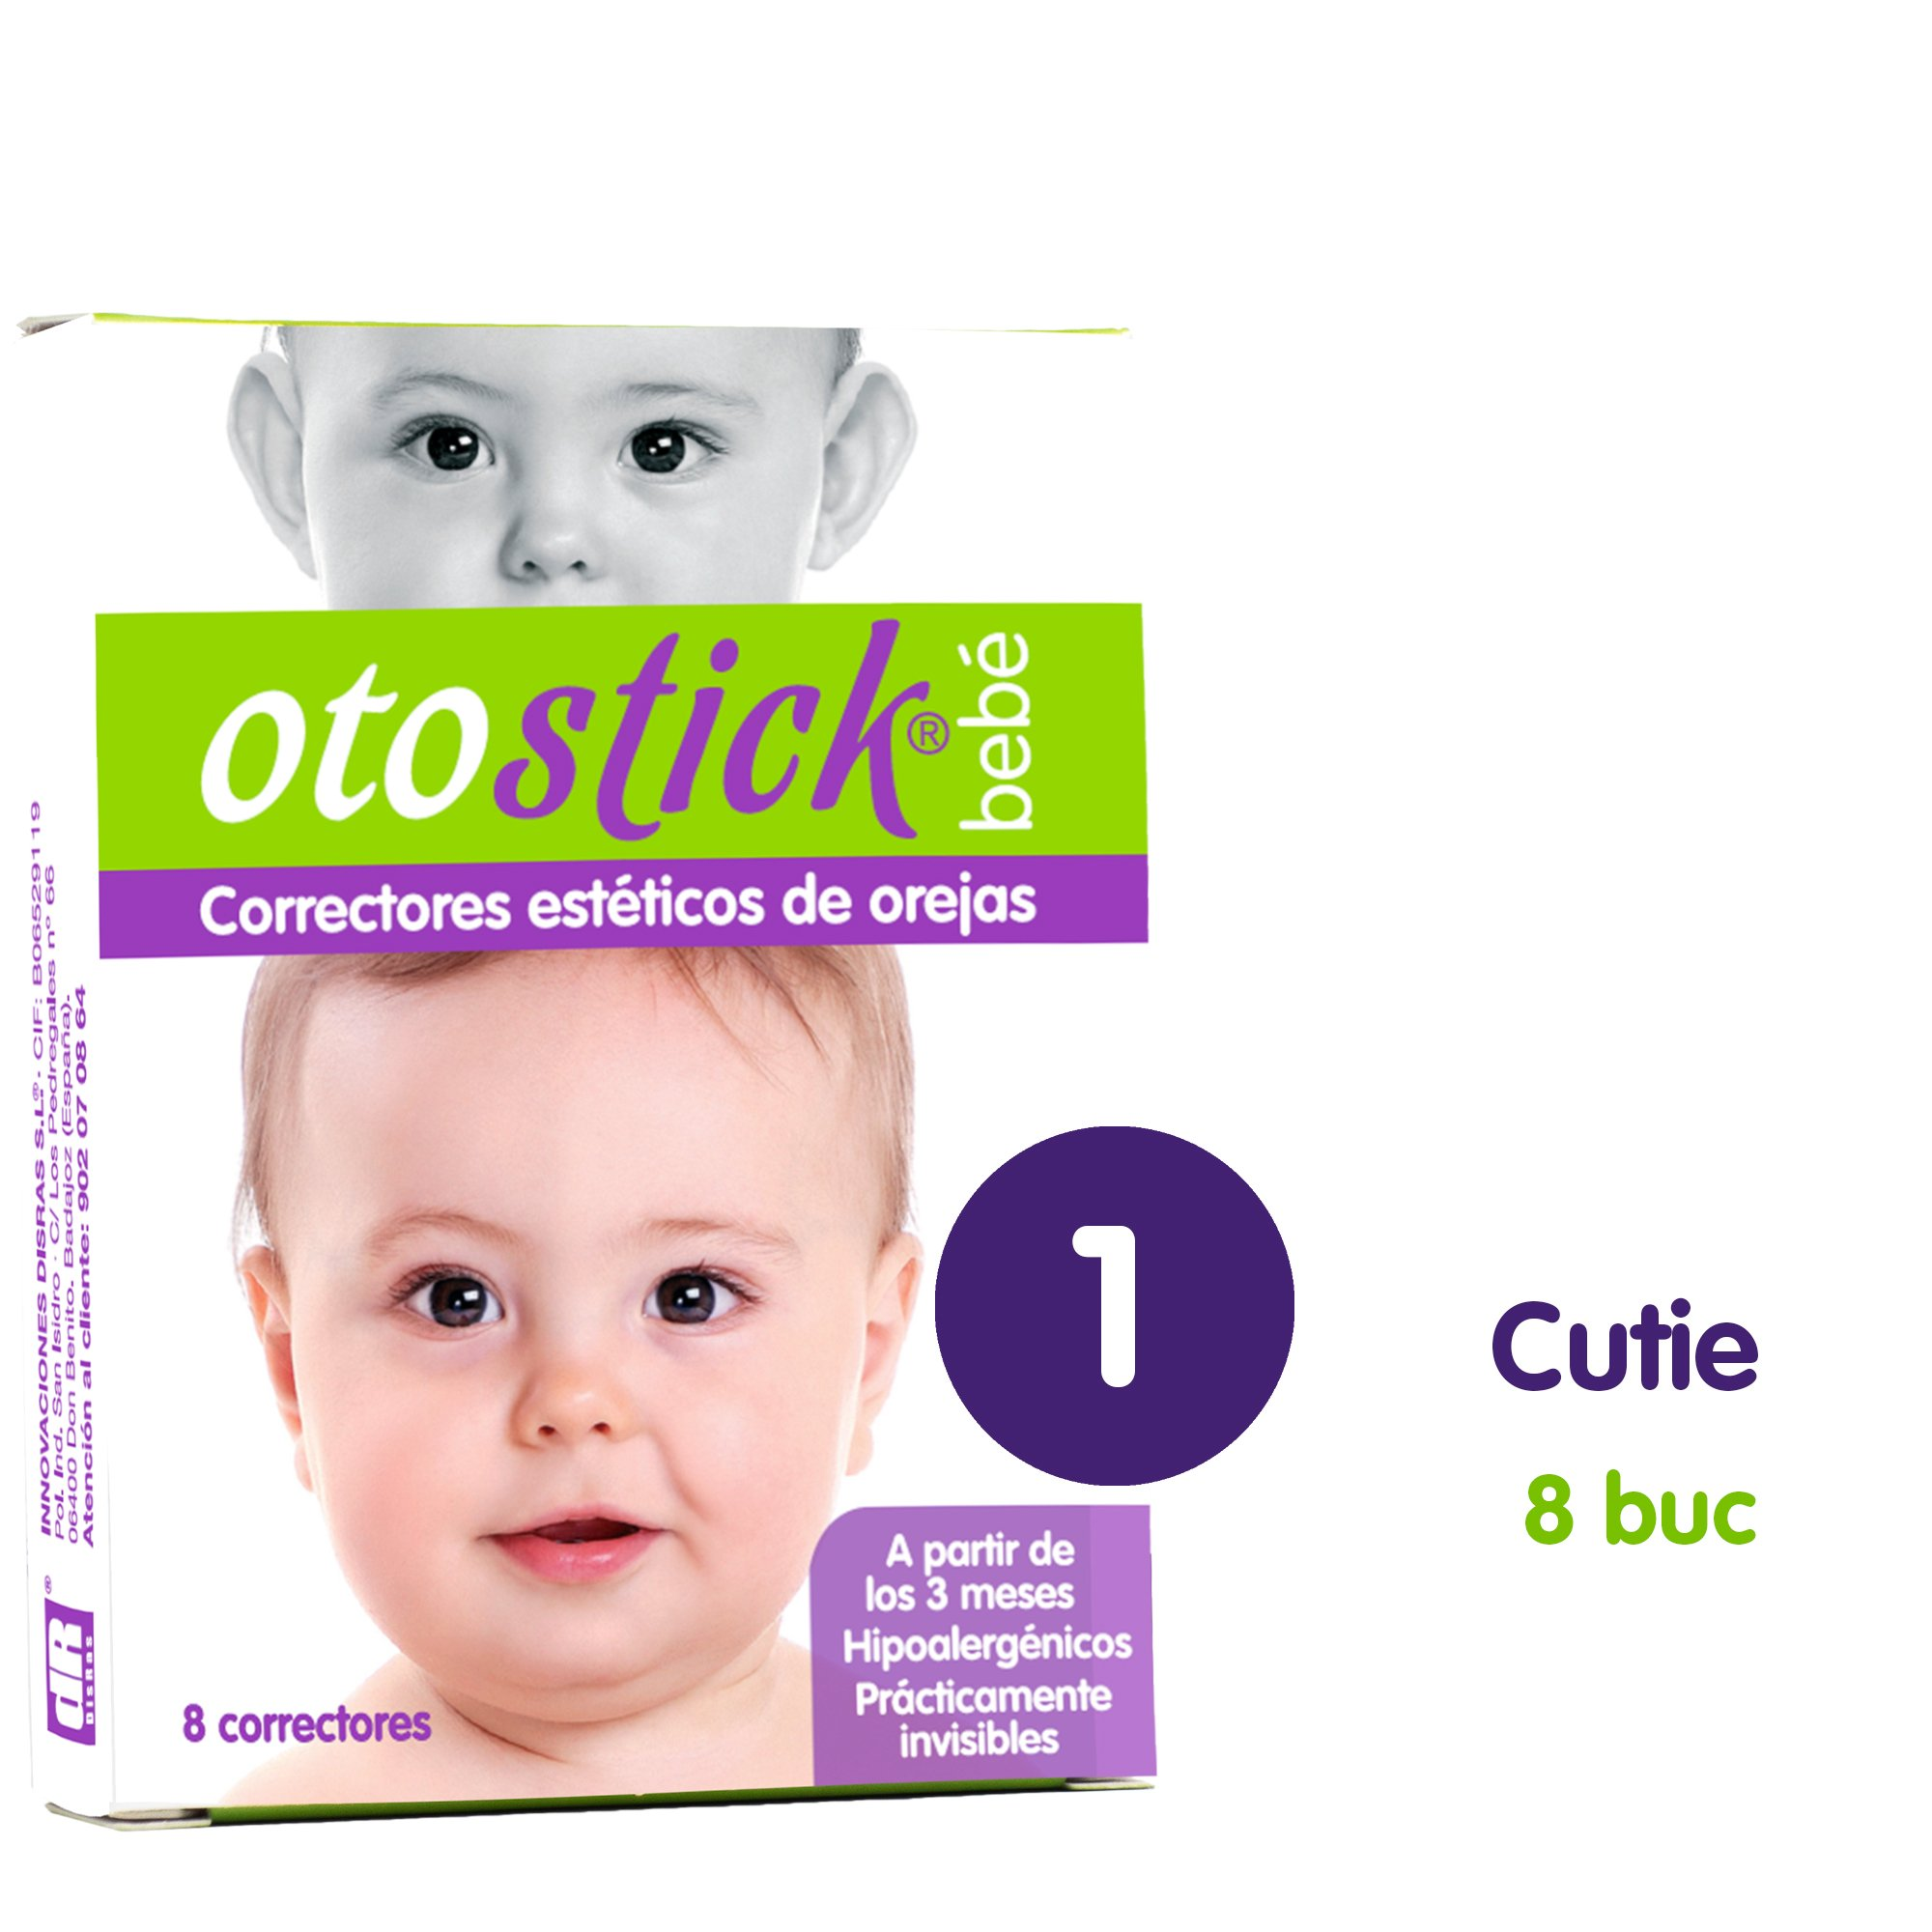 otostick-baby-1